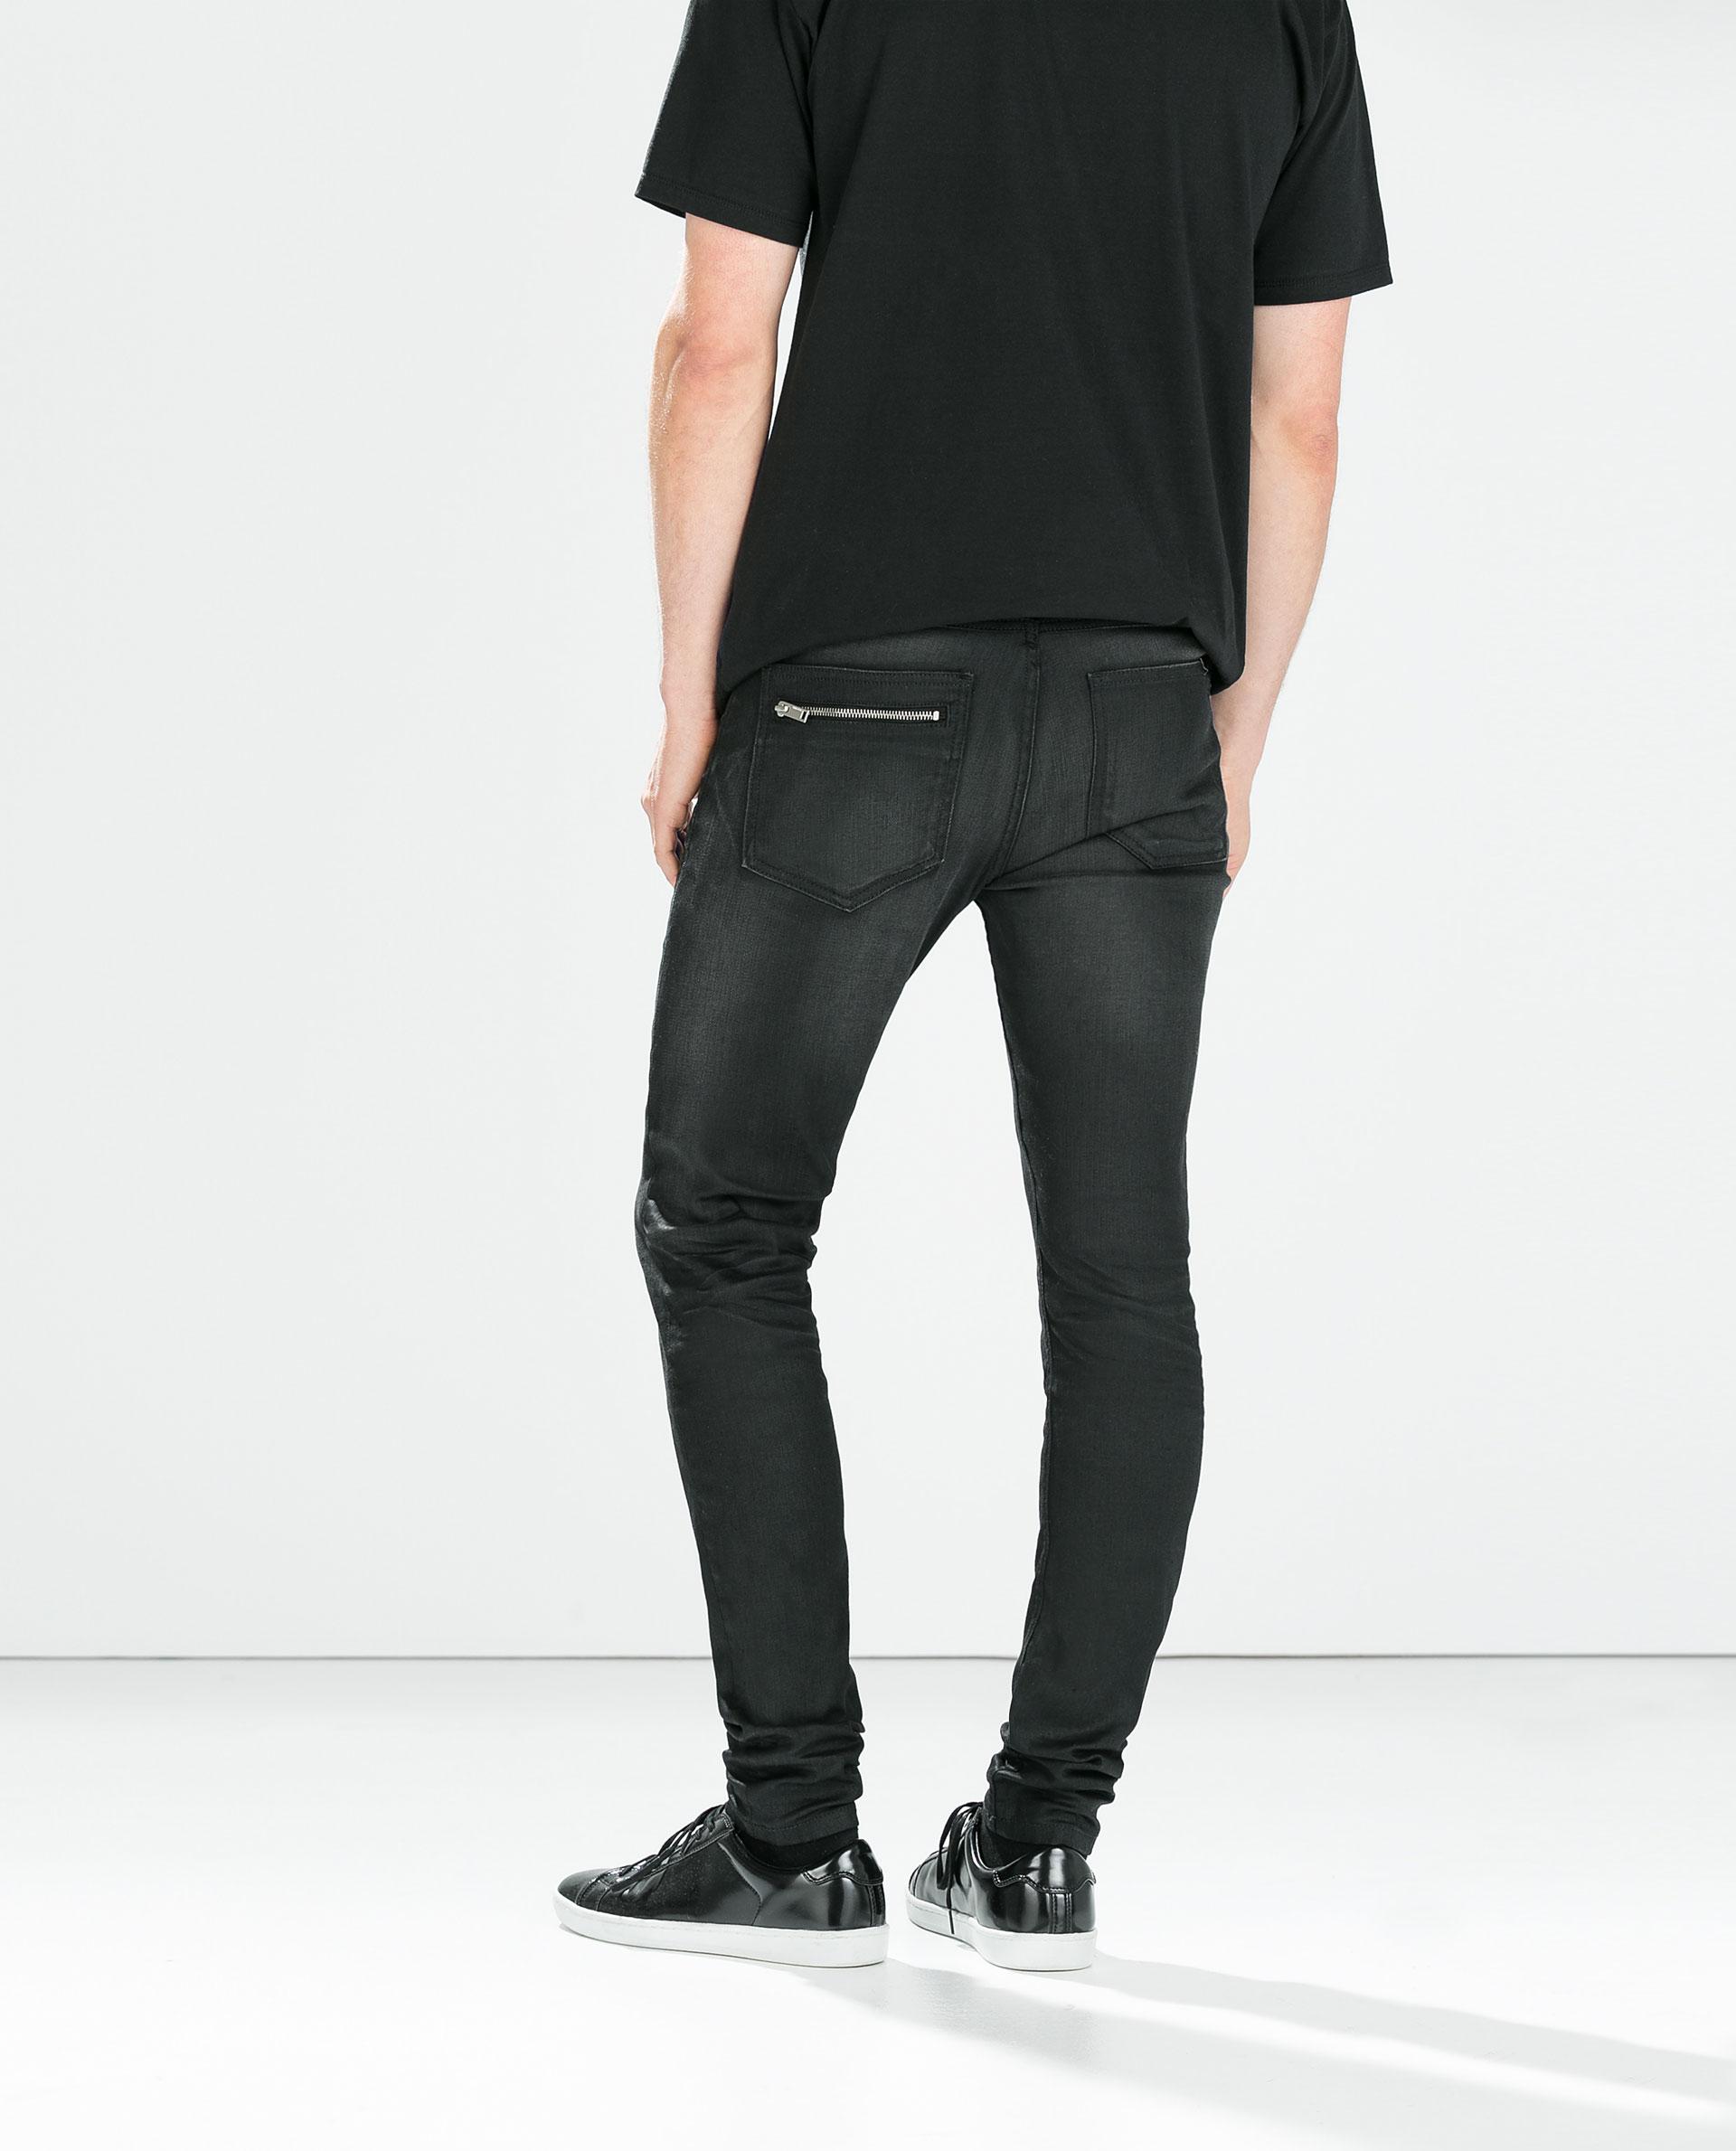 Zara Black Jeans with Zips in Black for Men | Lyst